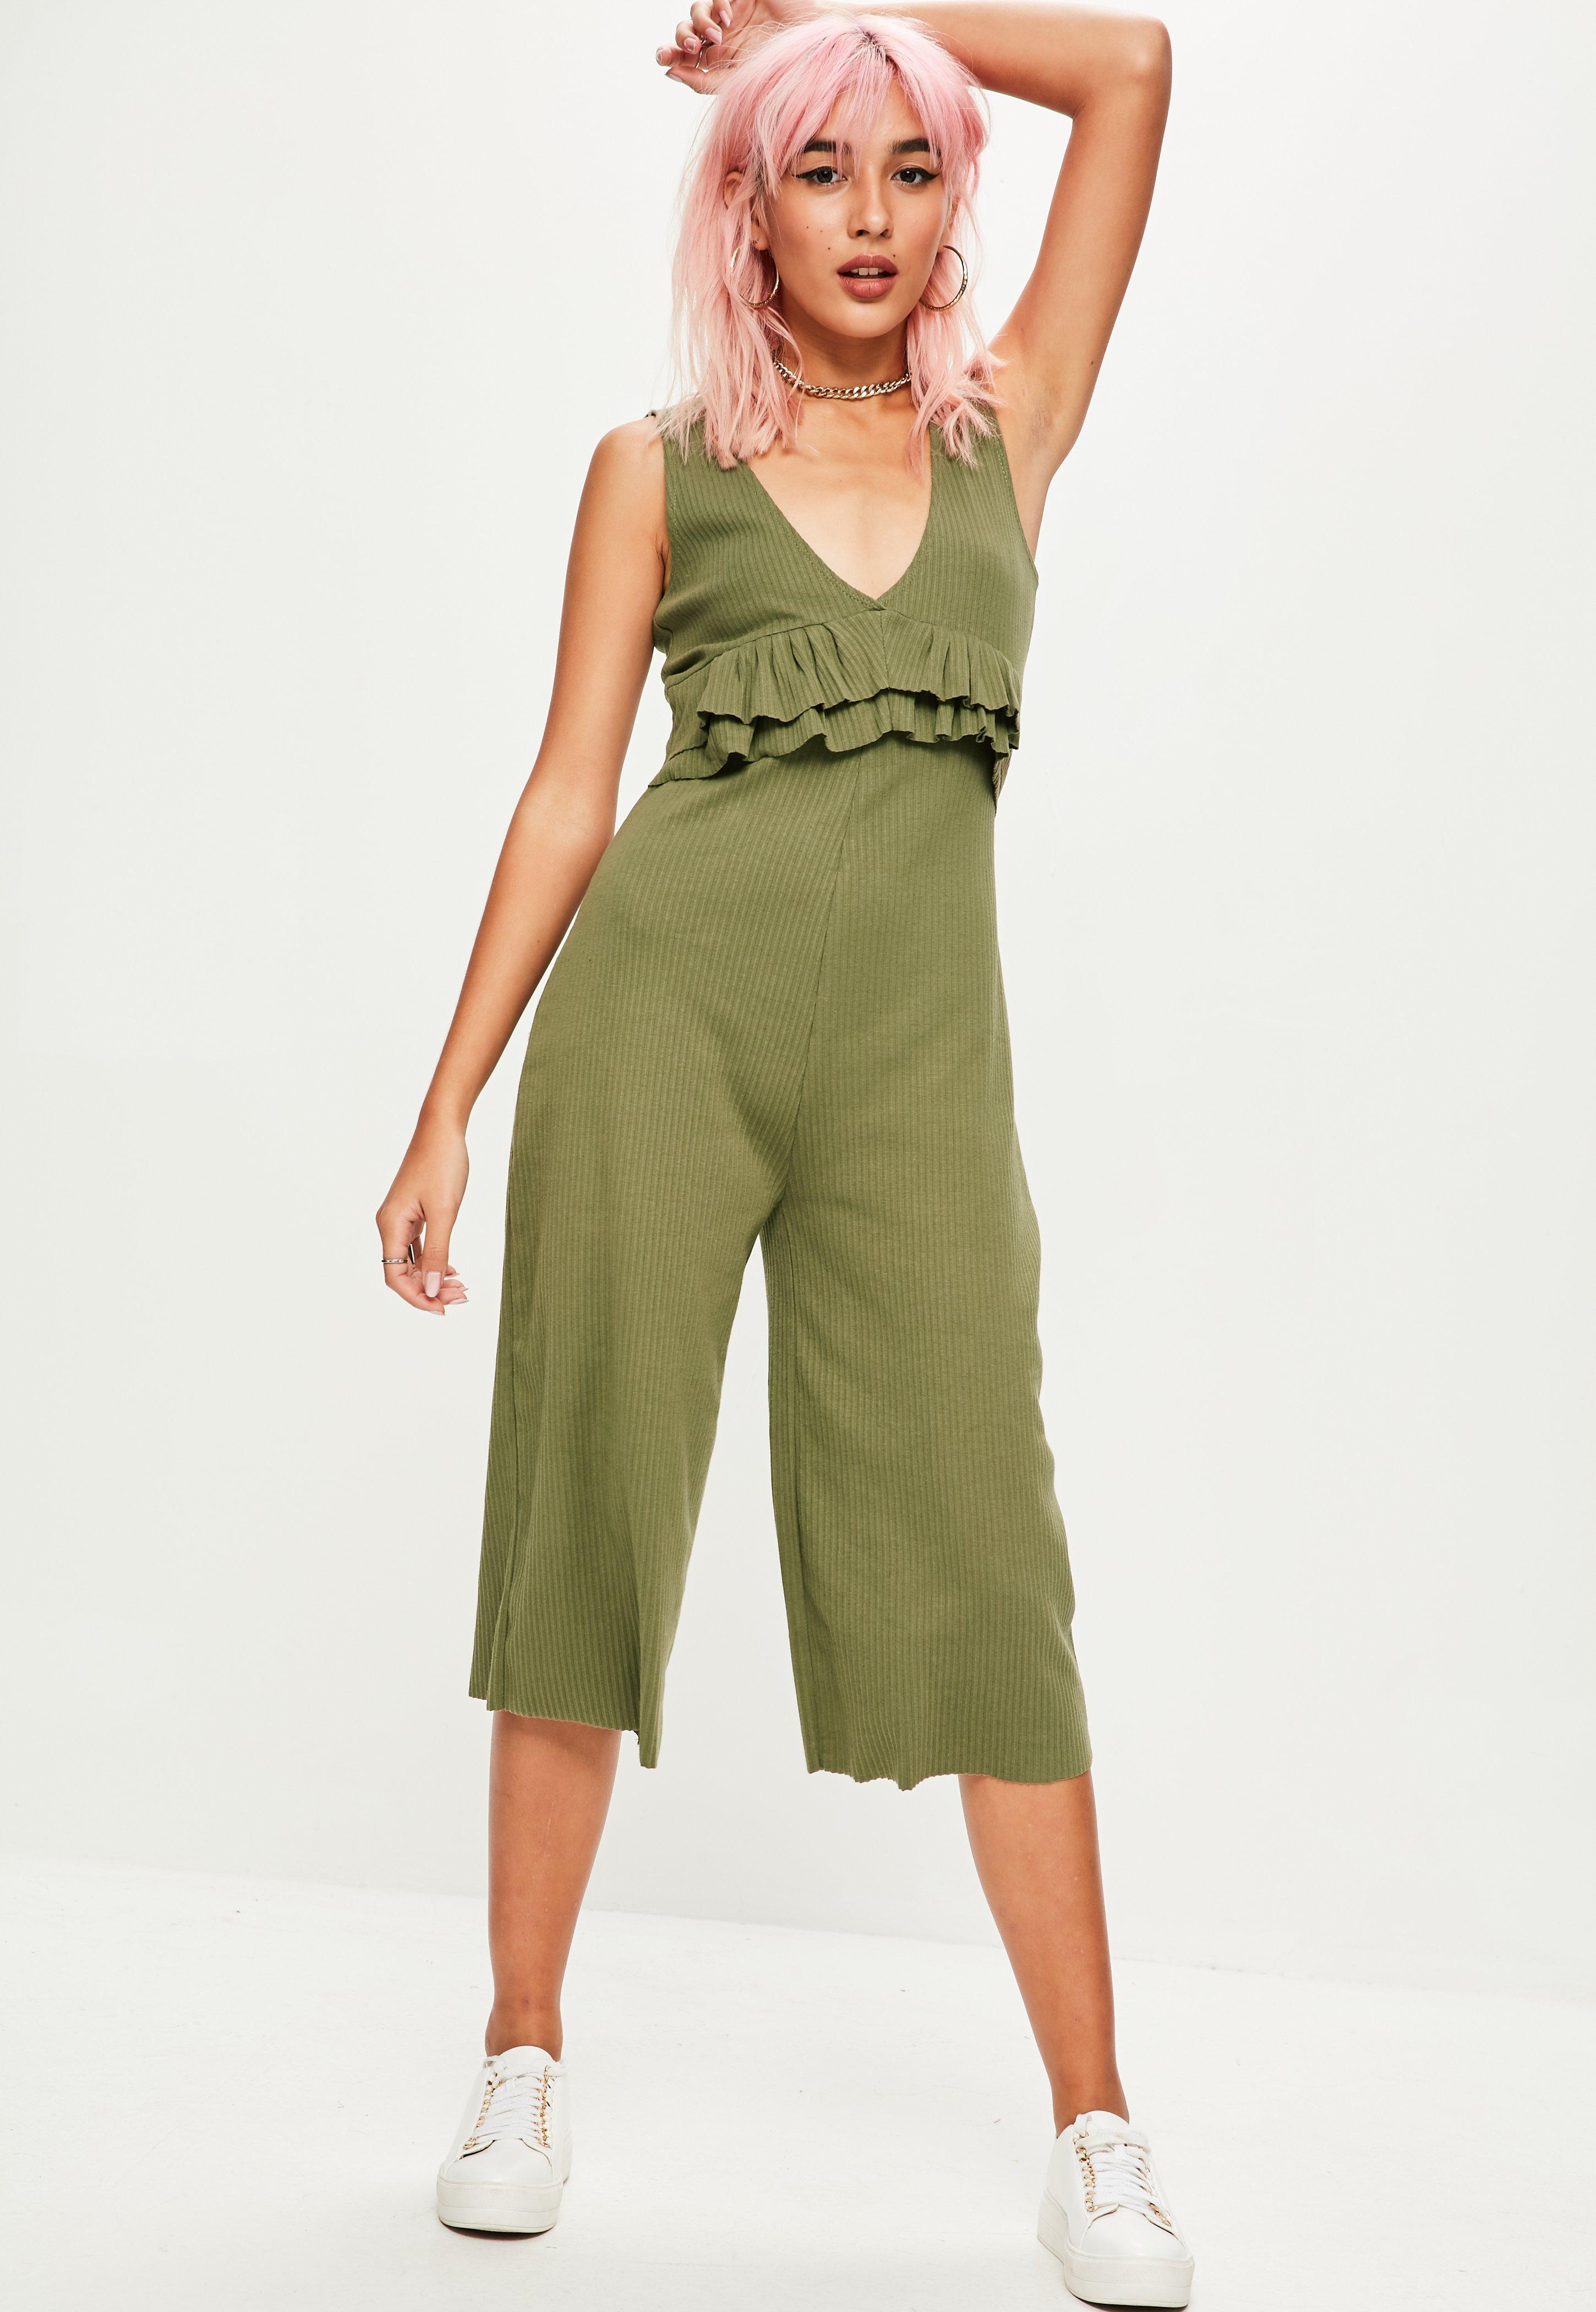 941cd14cbf1 Lyst - Missguided Khaki Ribbed Sleeveless Jumpsuit in Green